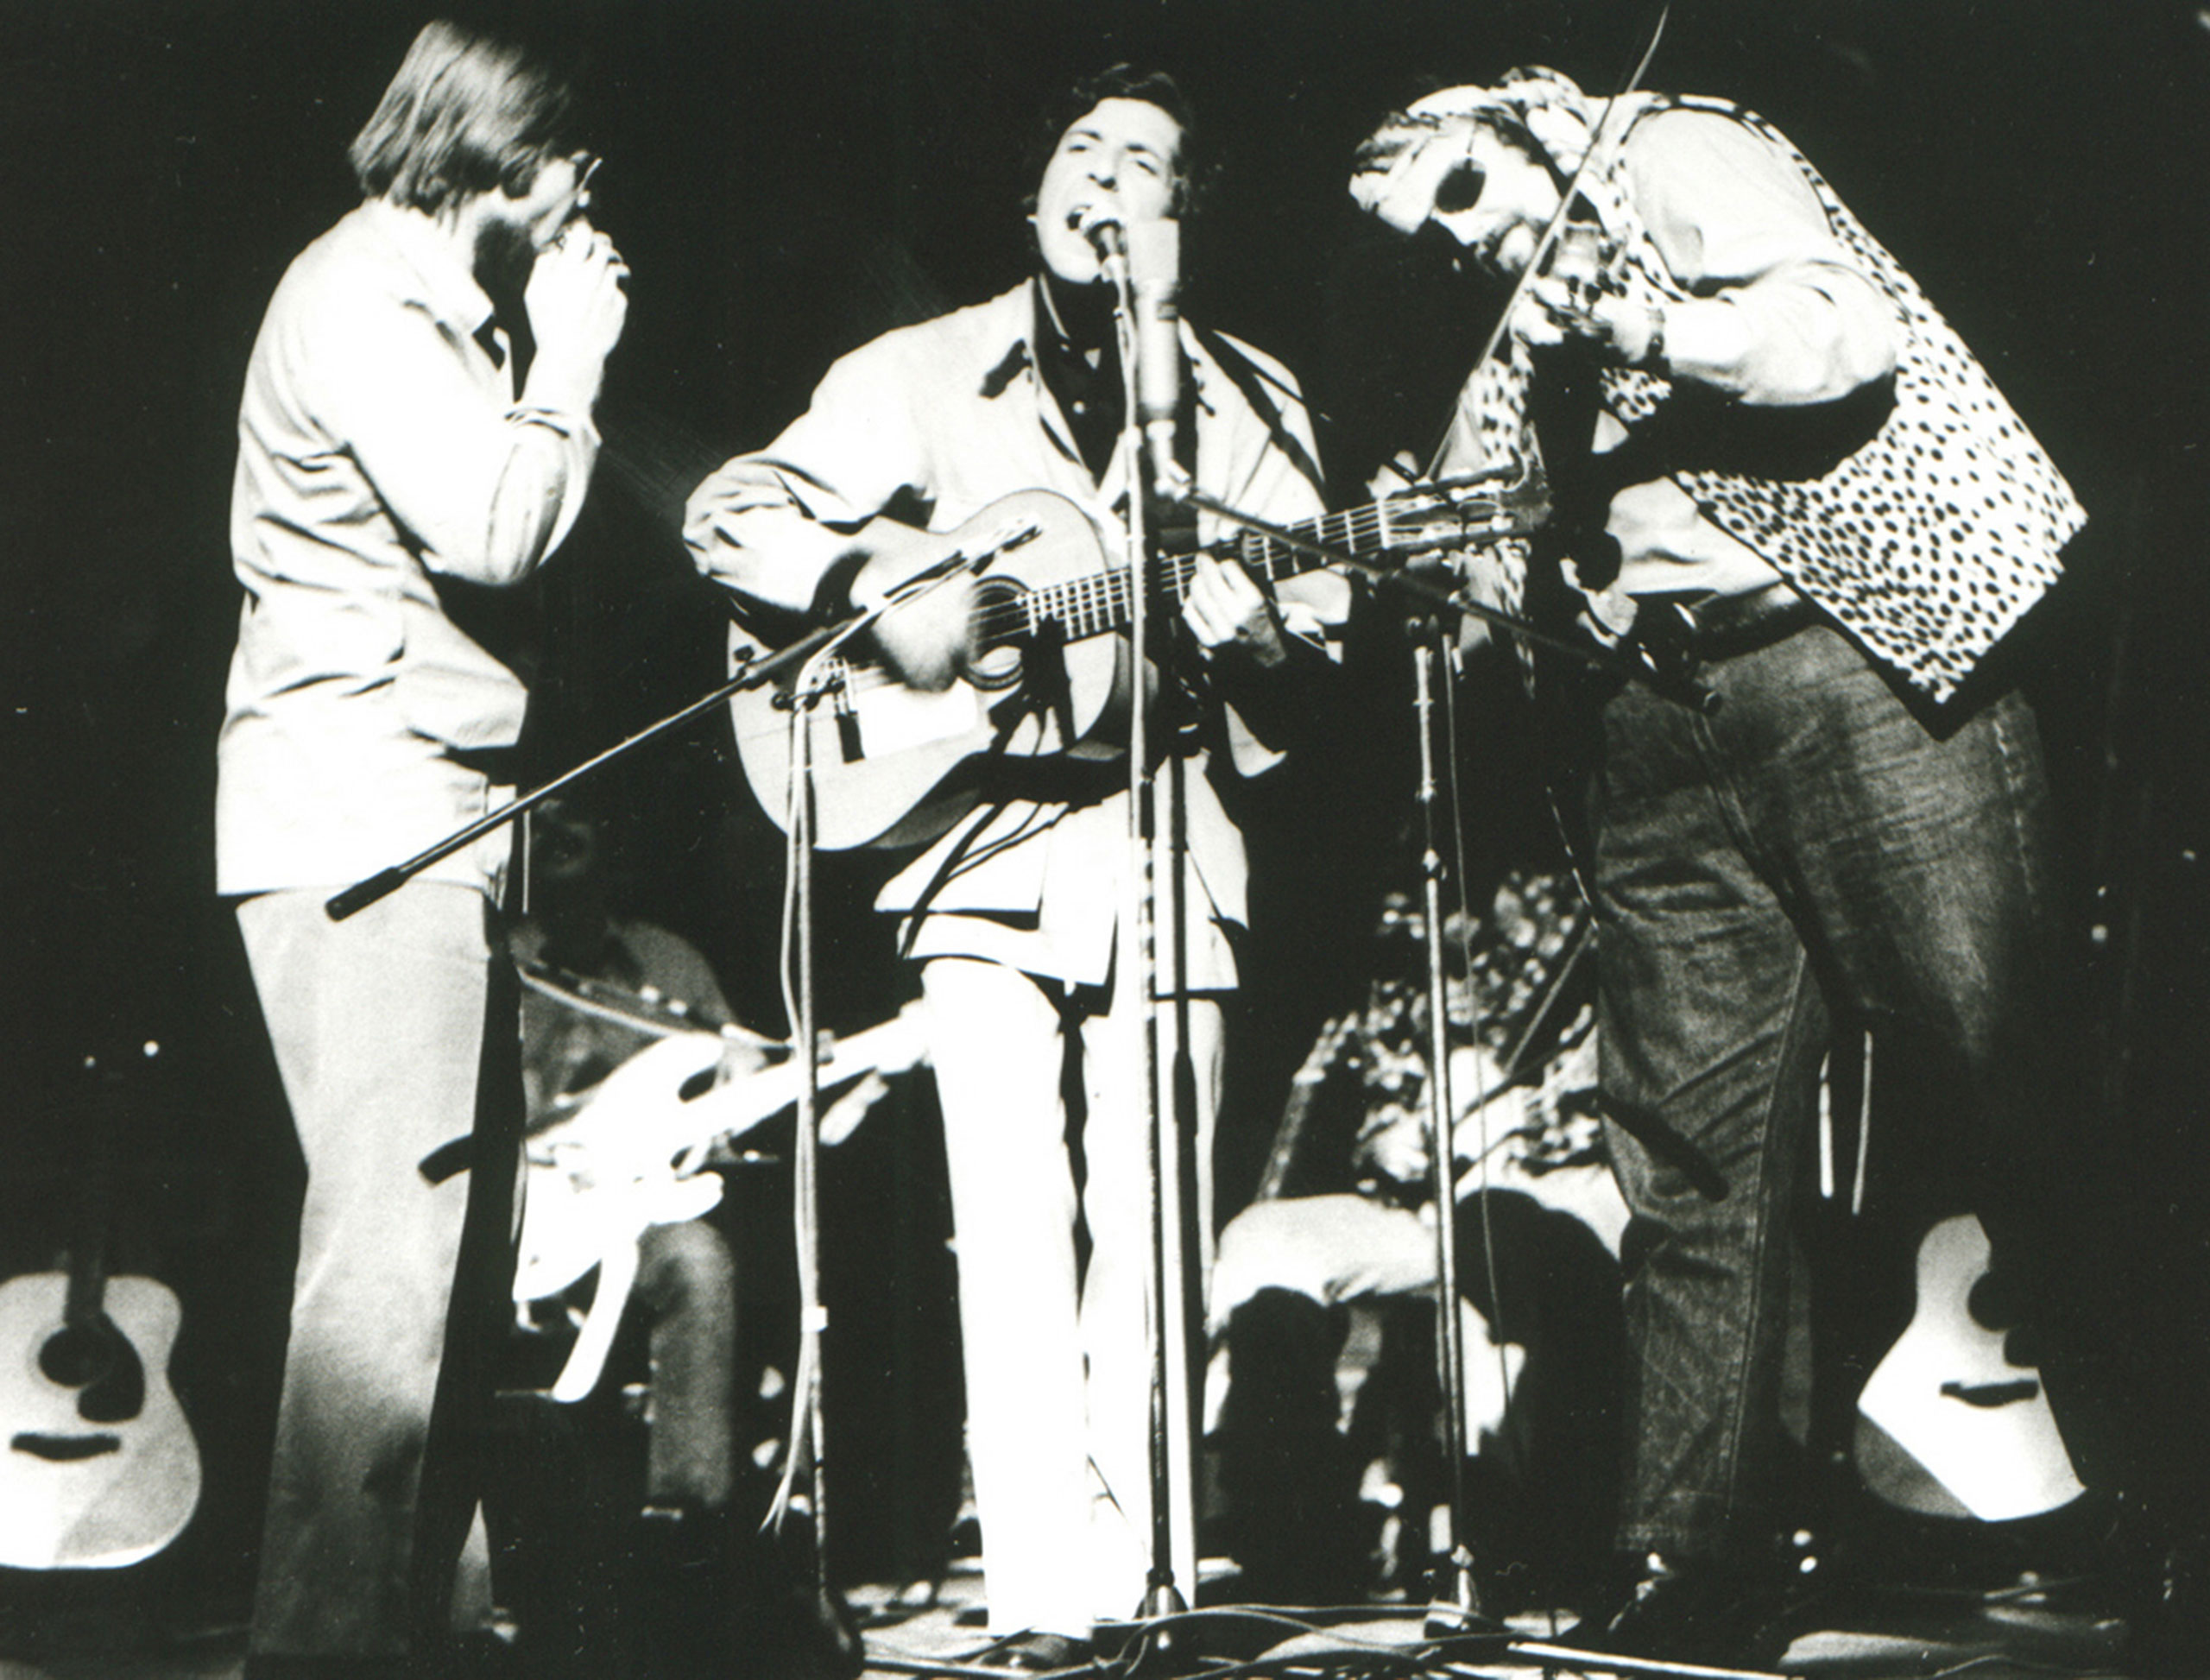 Bob Johnston, Ron Cornelius (seated), Leonard Cohen, and Charlie Daniels, early 1970s.